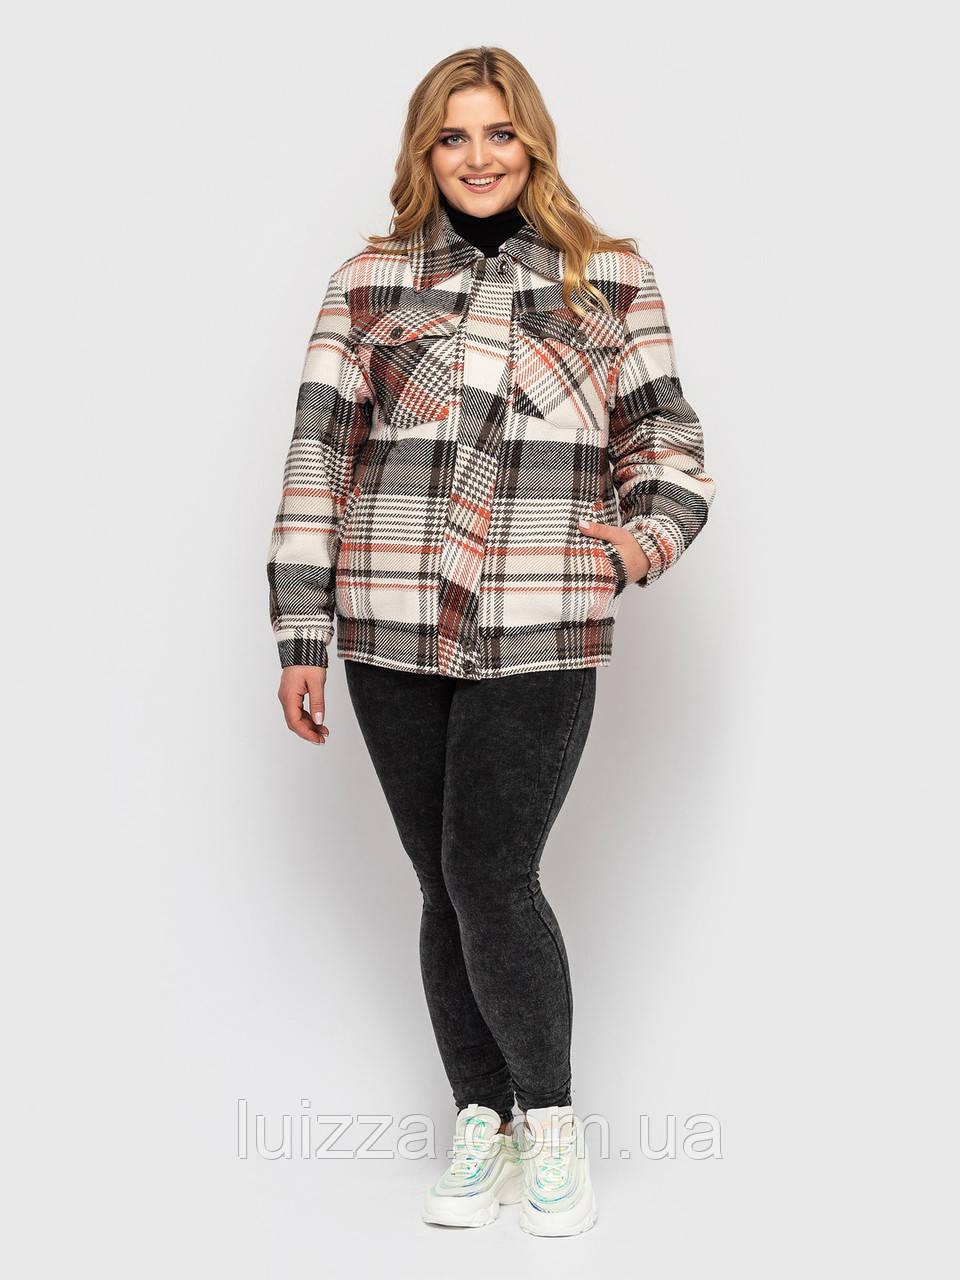 Женская фланелевая куртка 48-50, 52-54, 56-58 р, бежевый